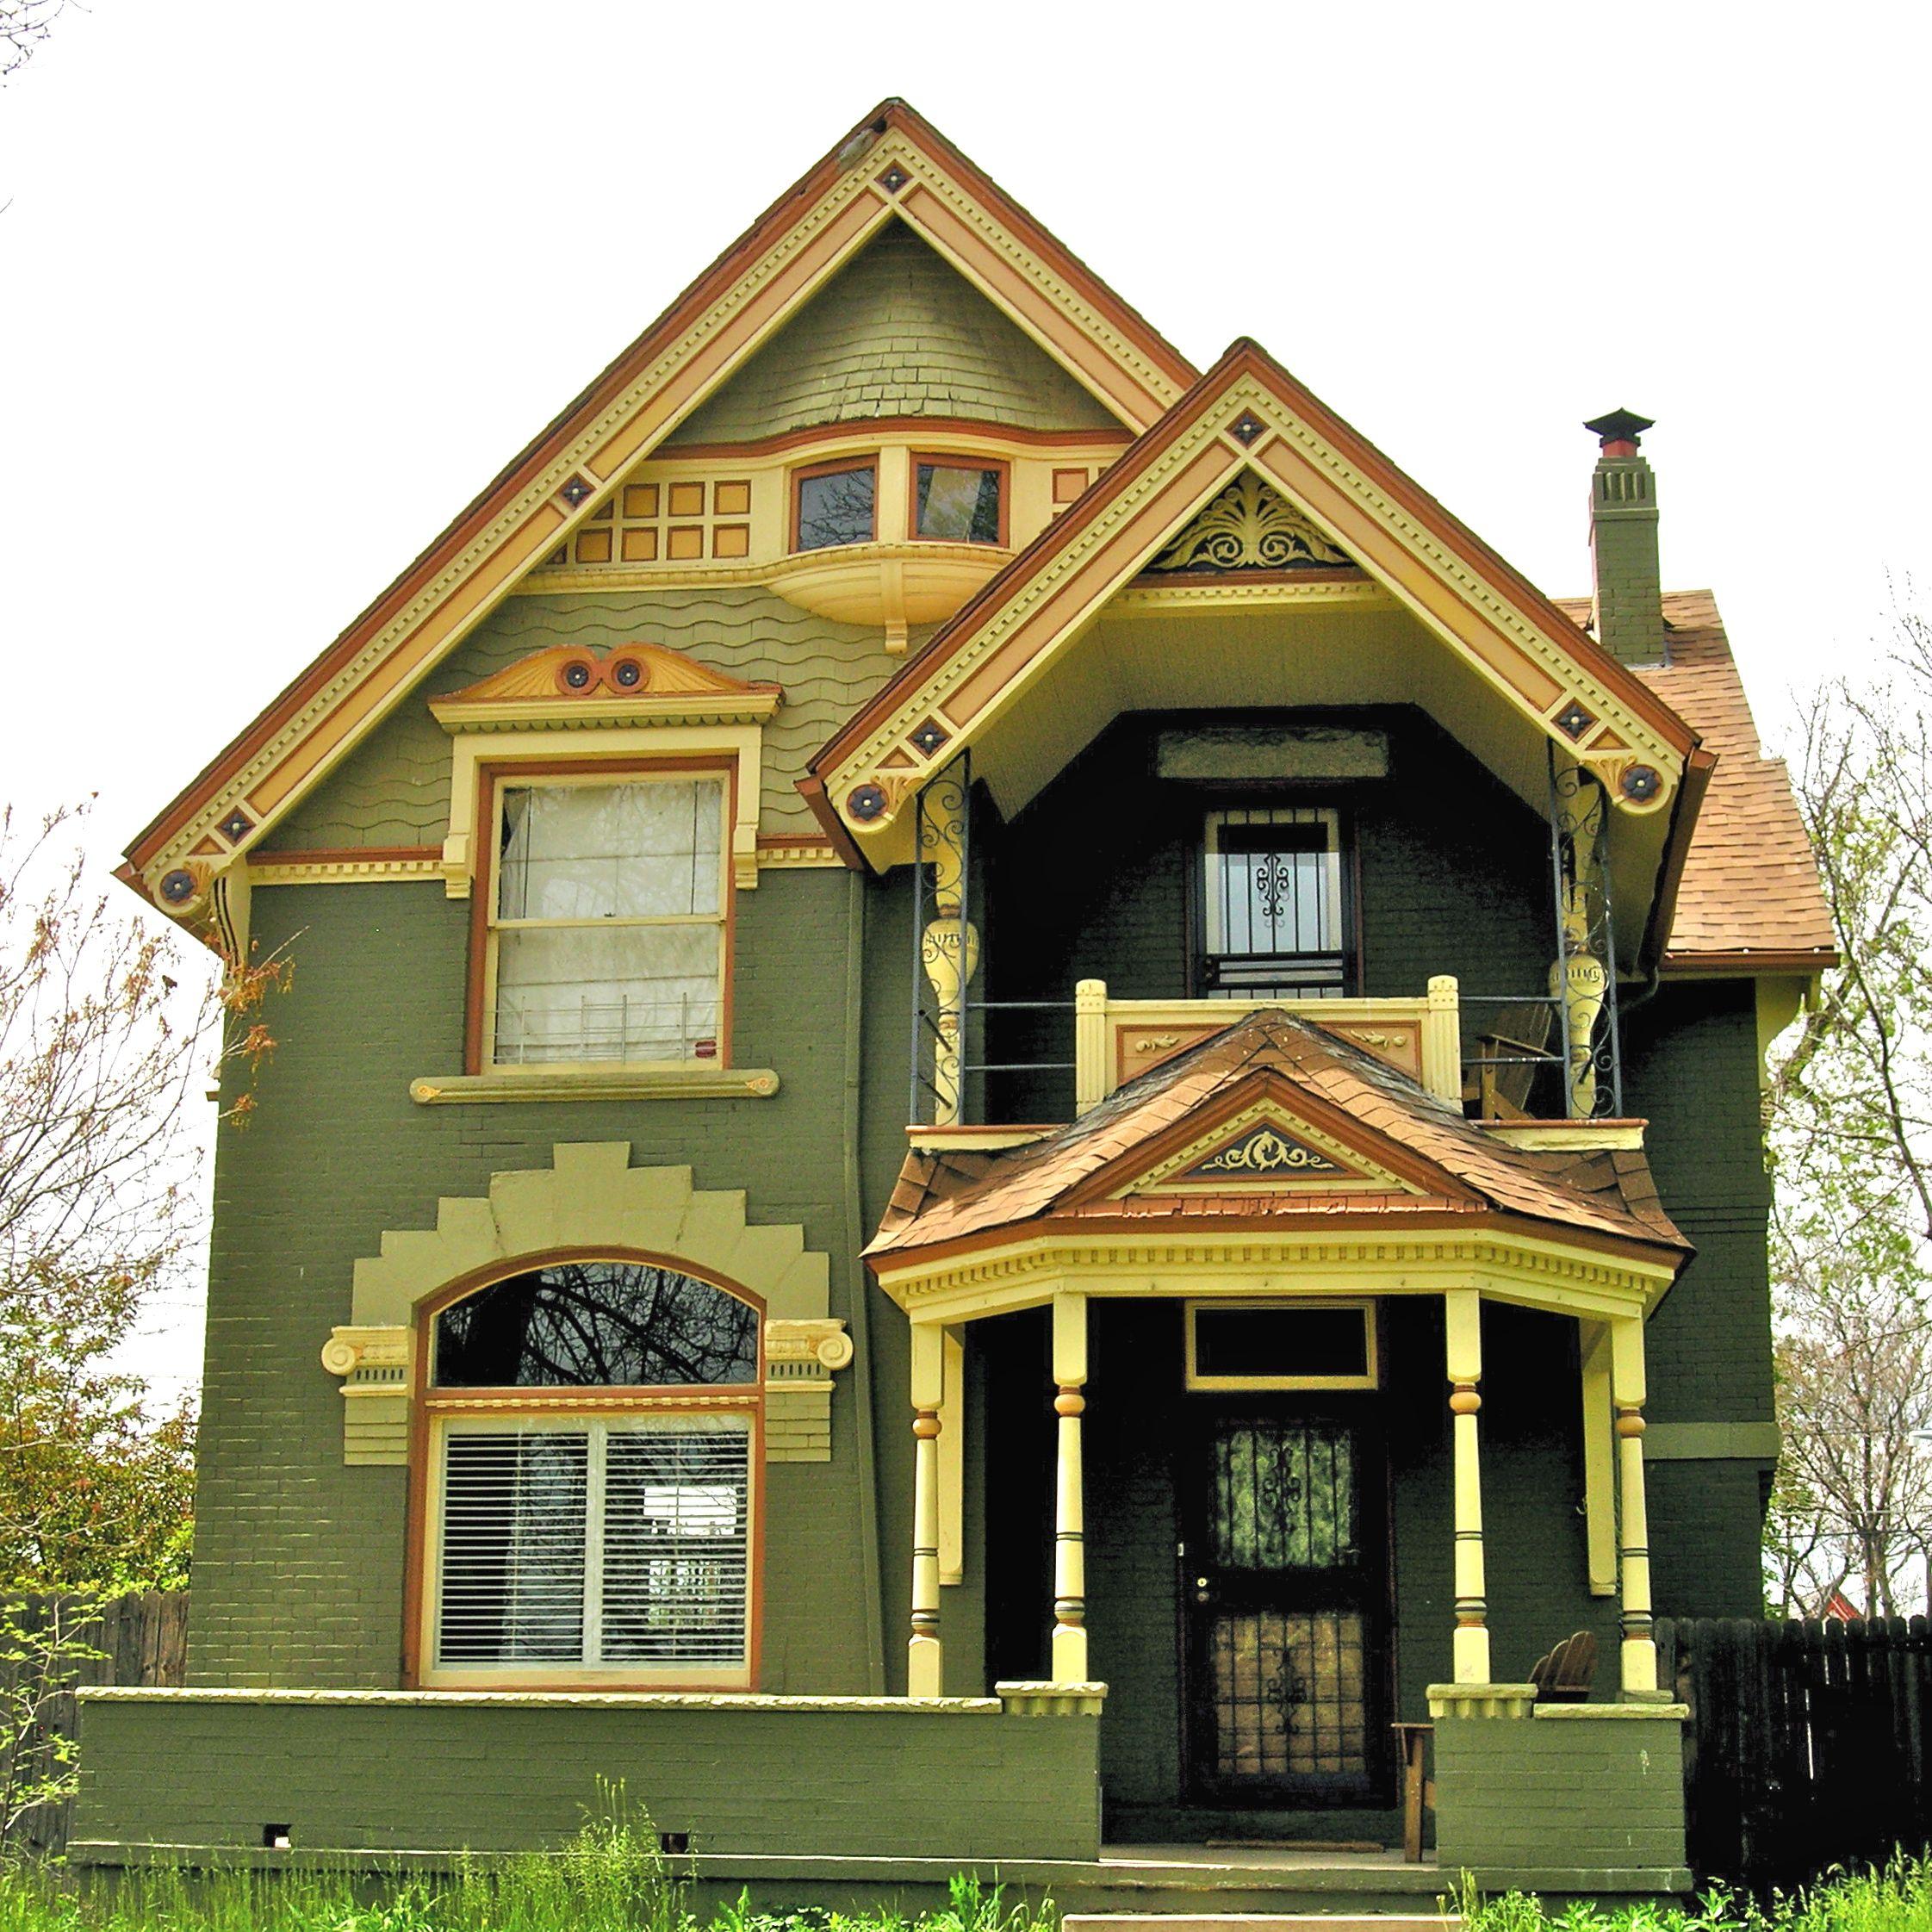 Denver Victorian Victorian Buildings Pinterest Victorian Denver And Architecture